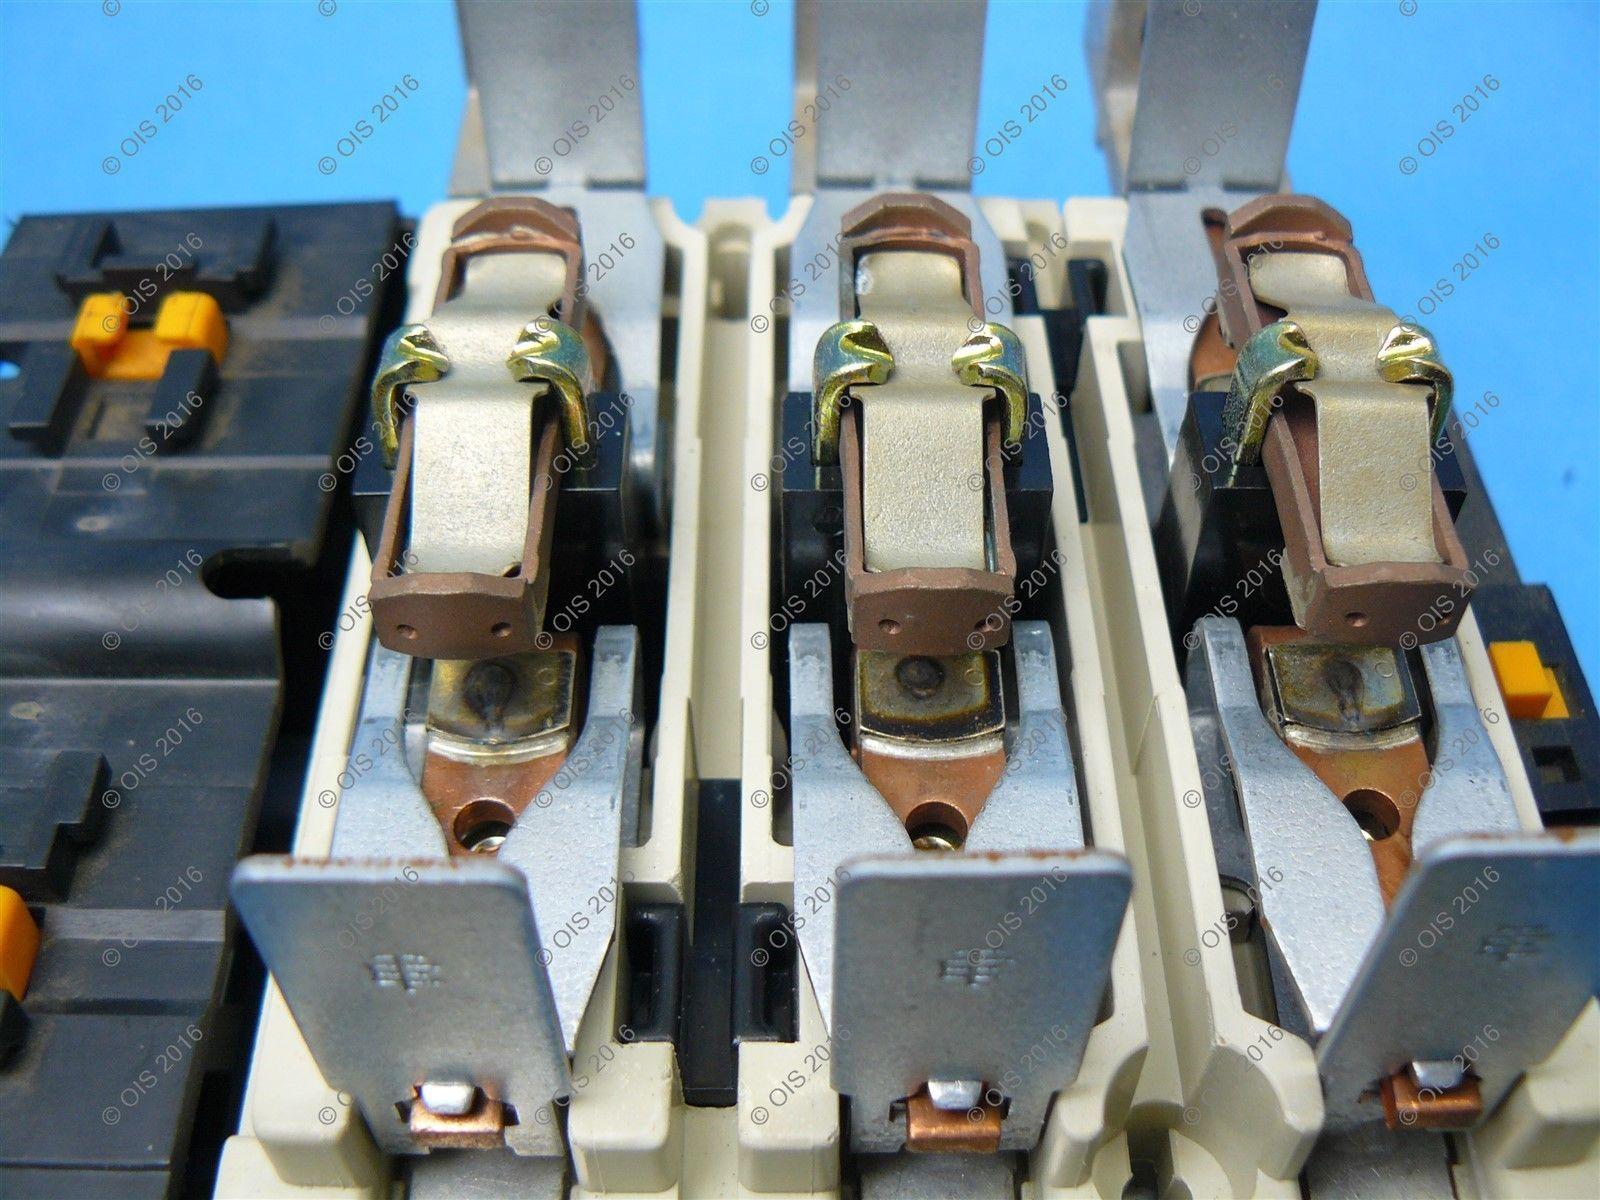 Telemecanique LC1F115G6 IEC Motor Starter 3 Pole 115I//200R Amp 120VAC Used